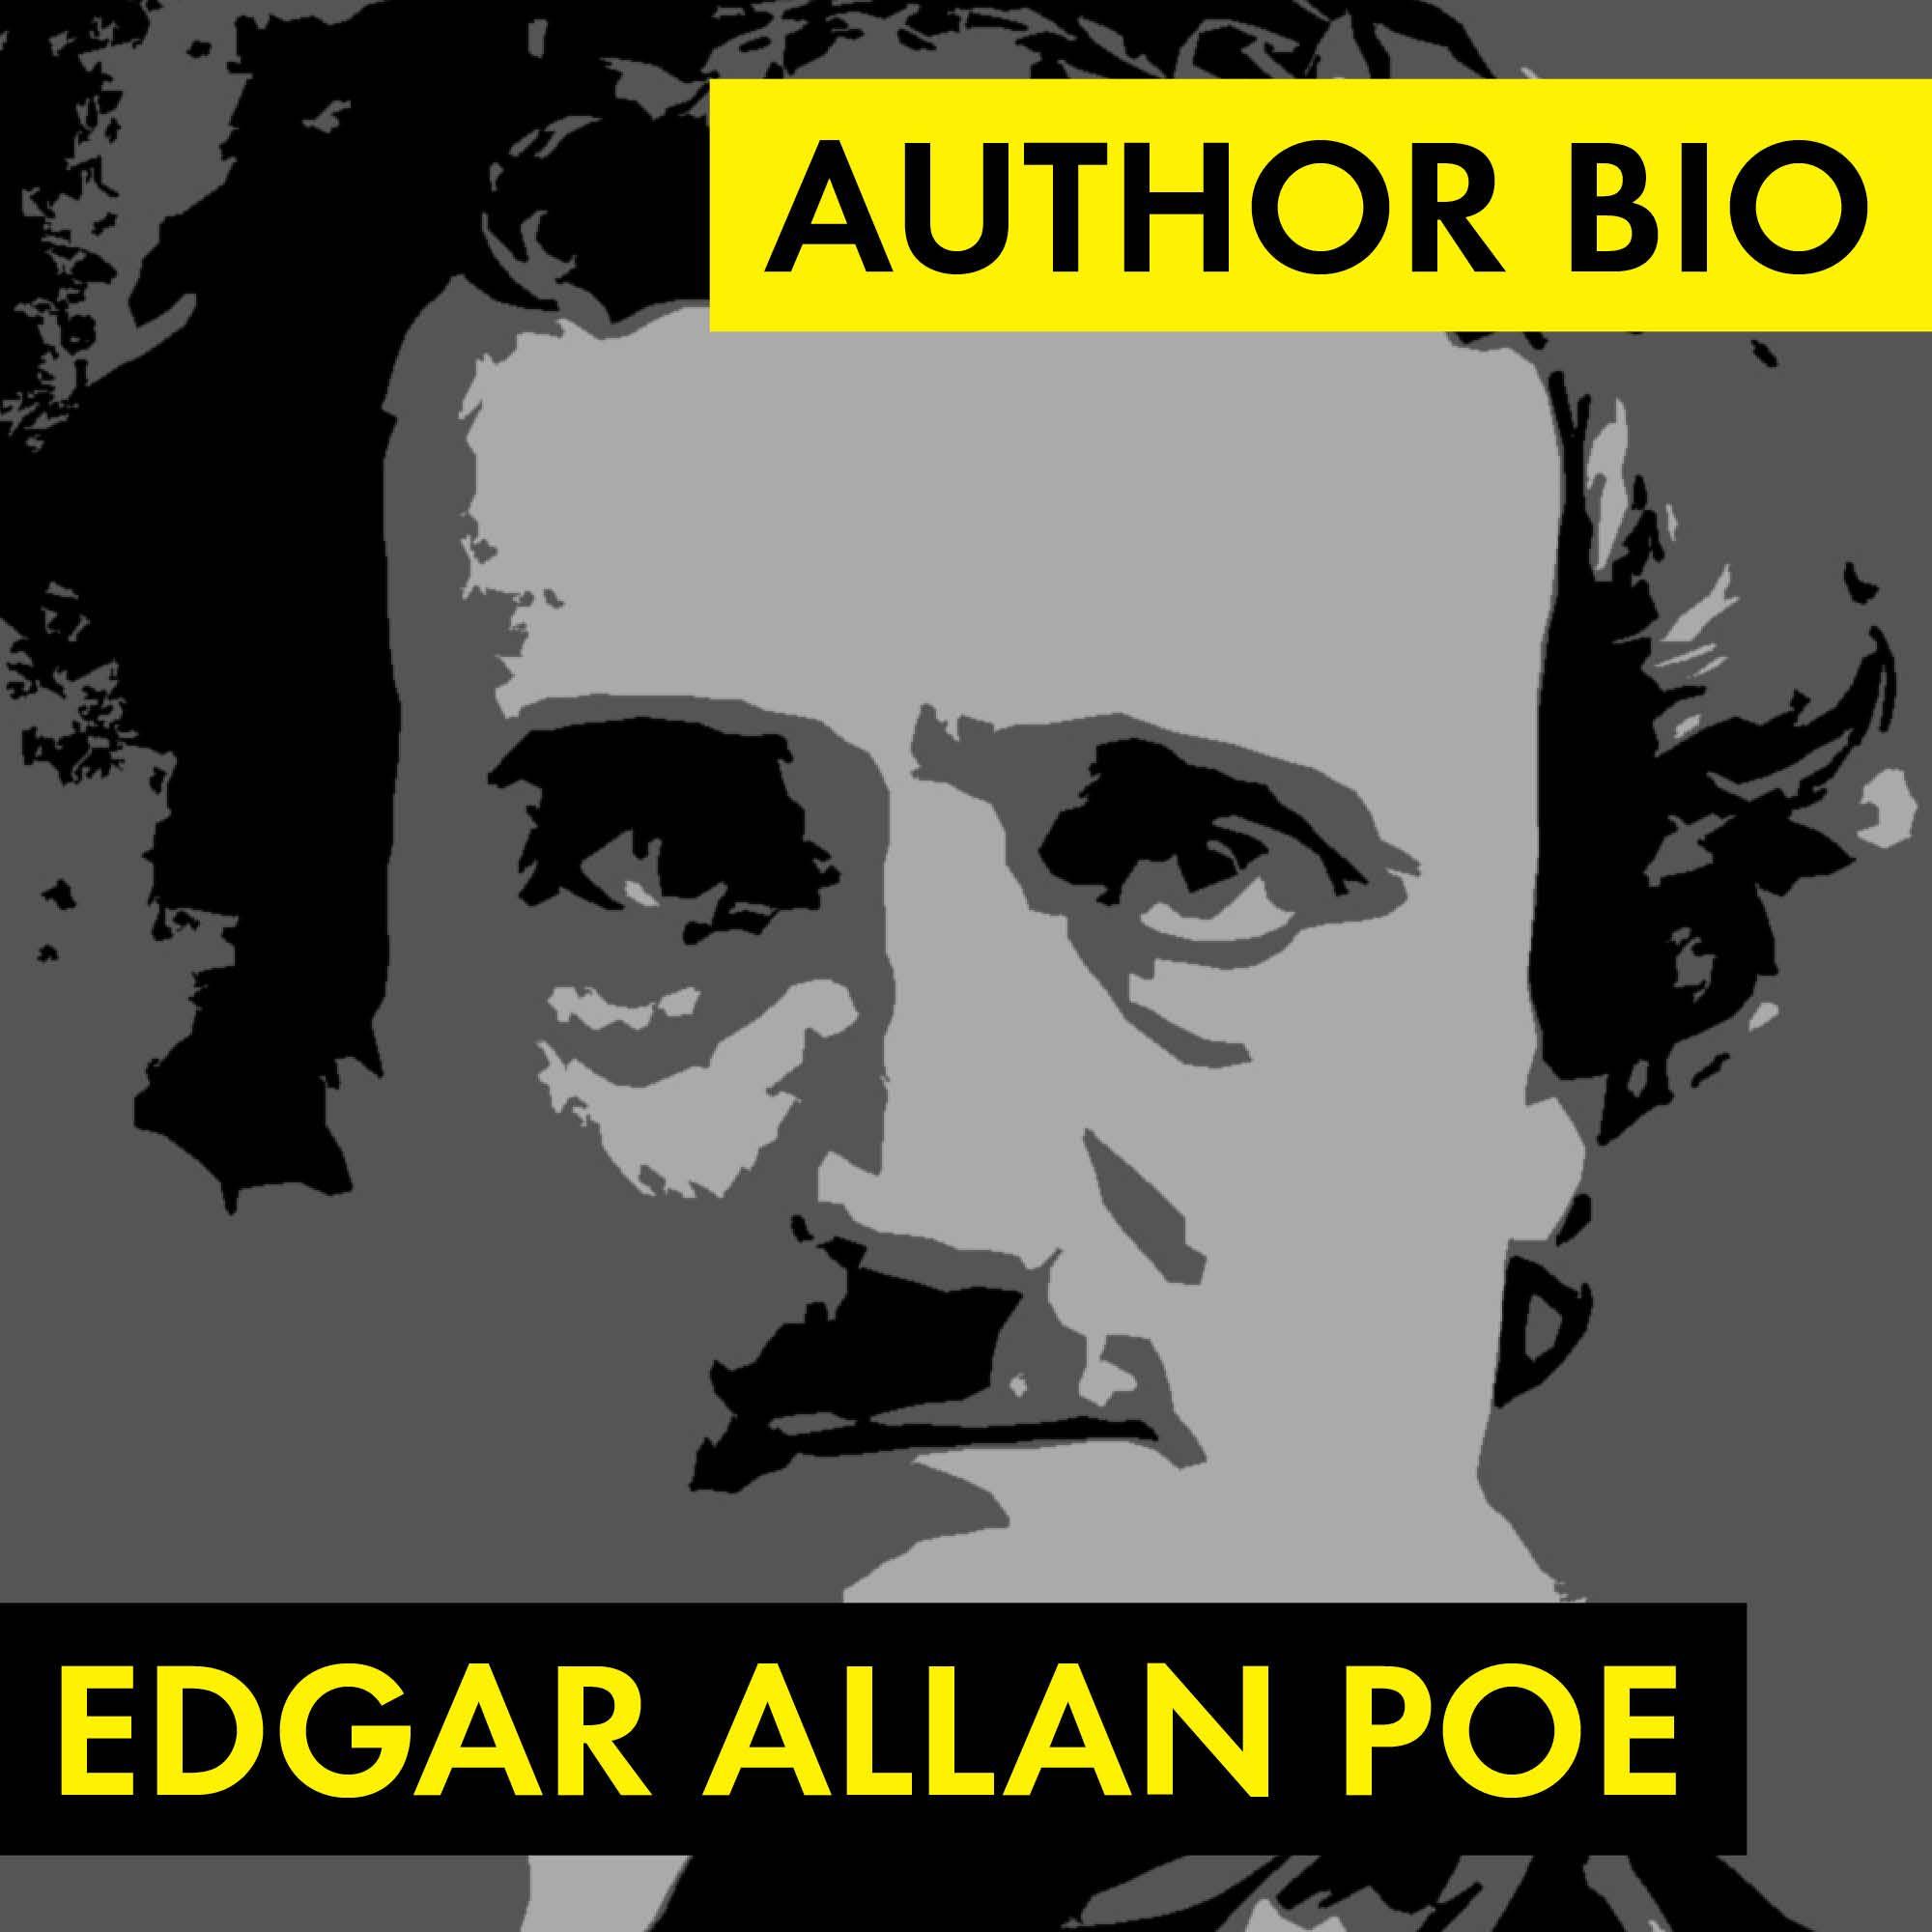 Edgar Allan Poe Biography Activity Highschool Middleschool Ela Poe Biography Activity Author Studies Edgar Allan Poe